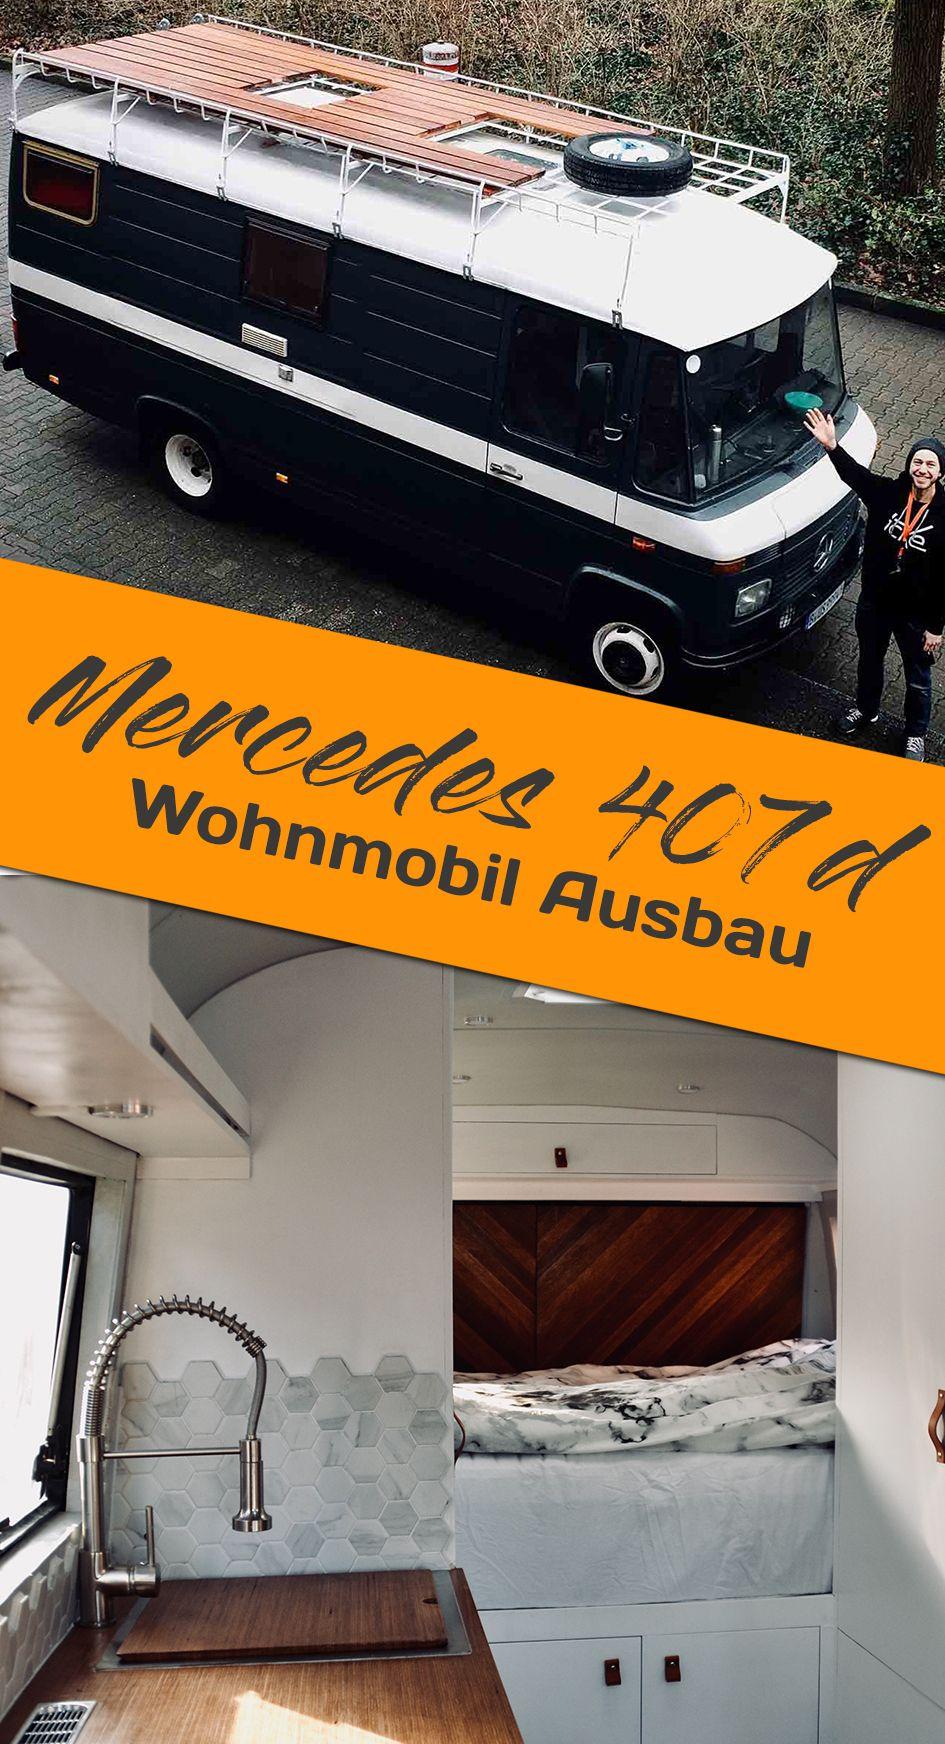 mercedes 407d als gebrauchtes wohnmobil ausbauen vanlife. Black Bedroom Furniture Sets. Home Design Ideas